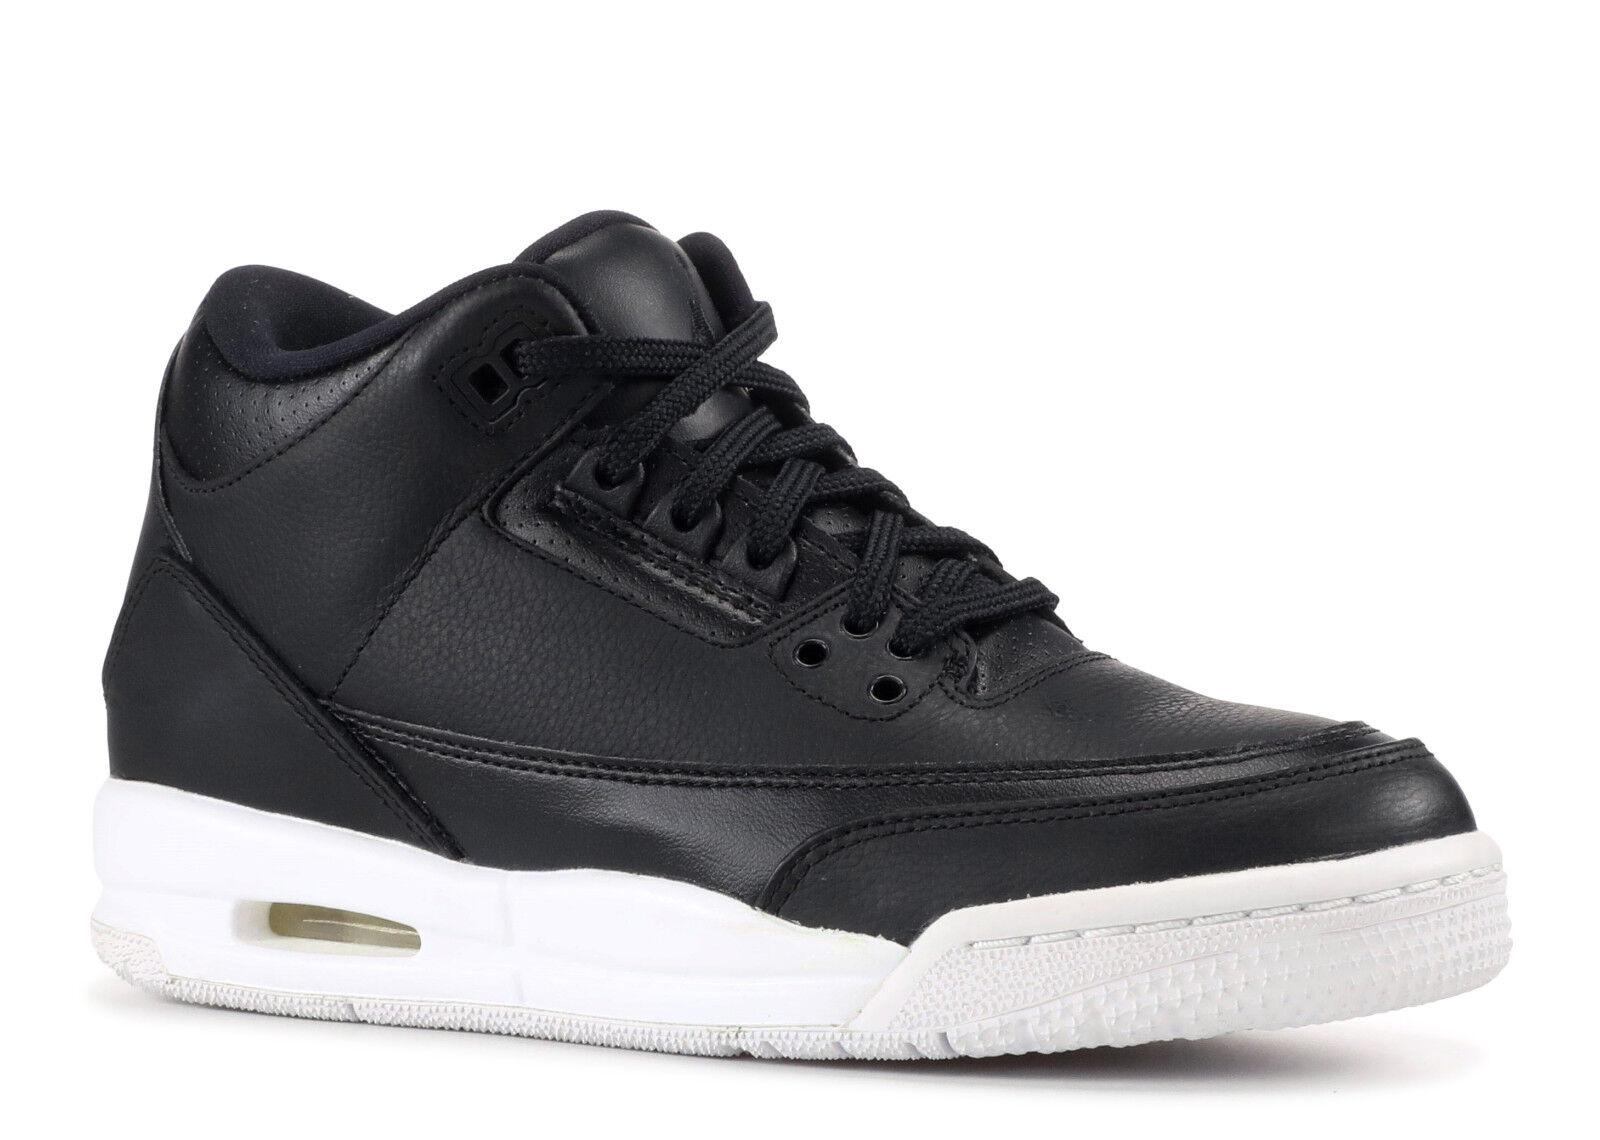 NEW Nike Air Jordan 3 Retro BG Youth Basketball shoes Black Kids Size 6Y